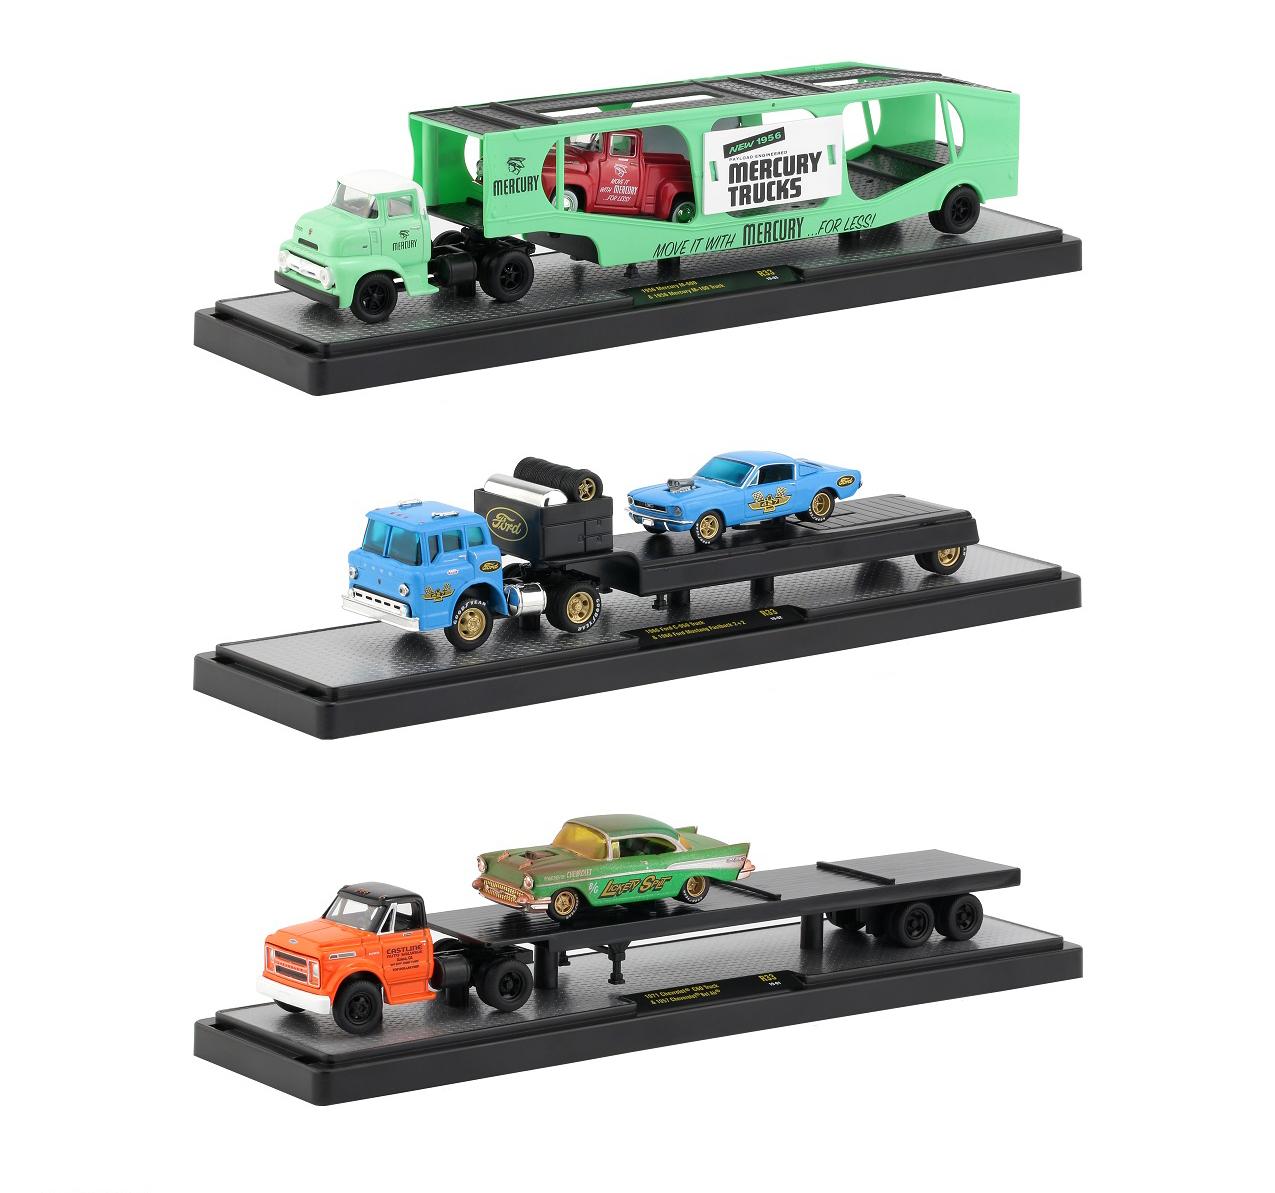 Auto Haulers Release 33 3 Trucks Set 1/64 Diecast Models By M2 Machines